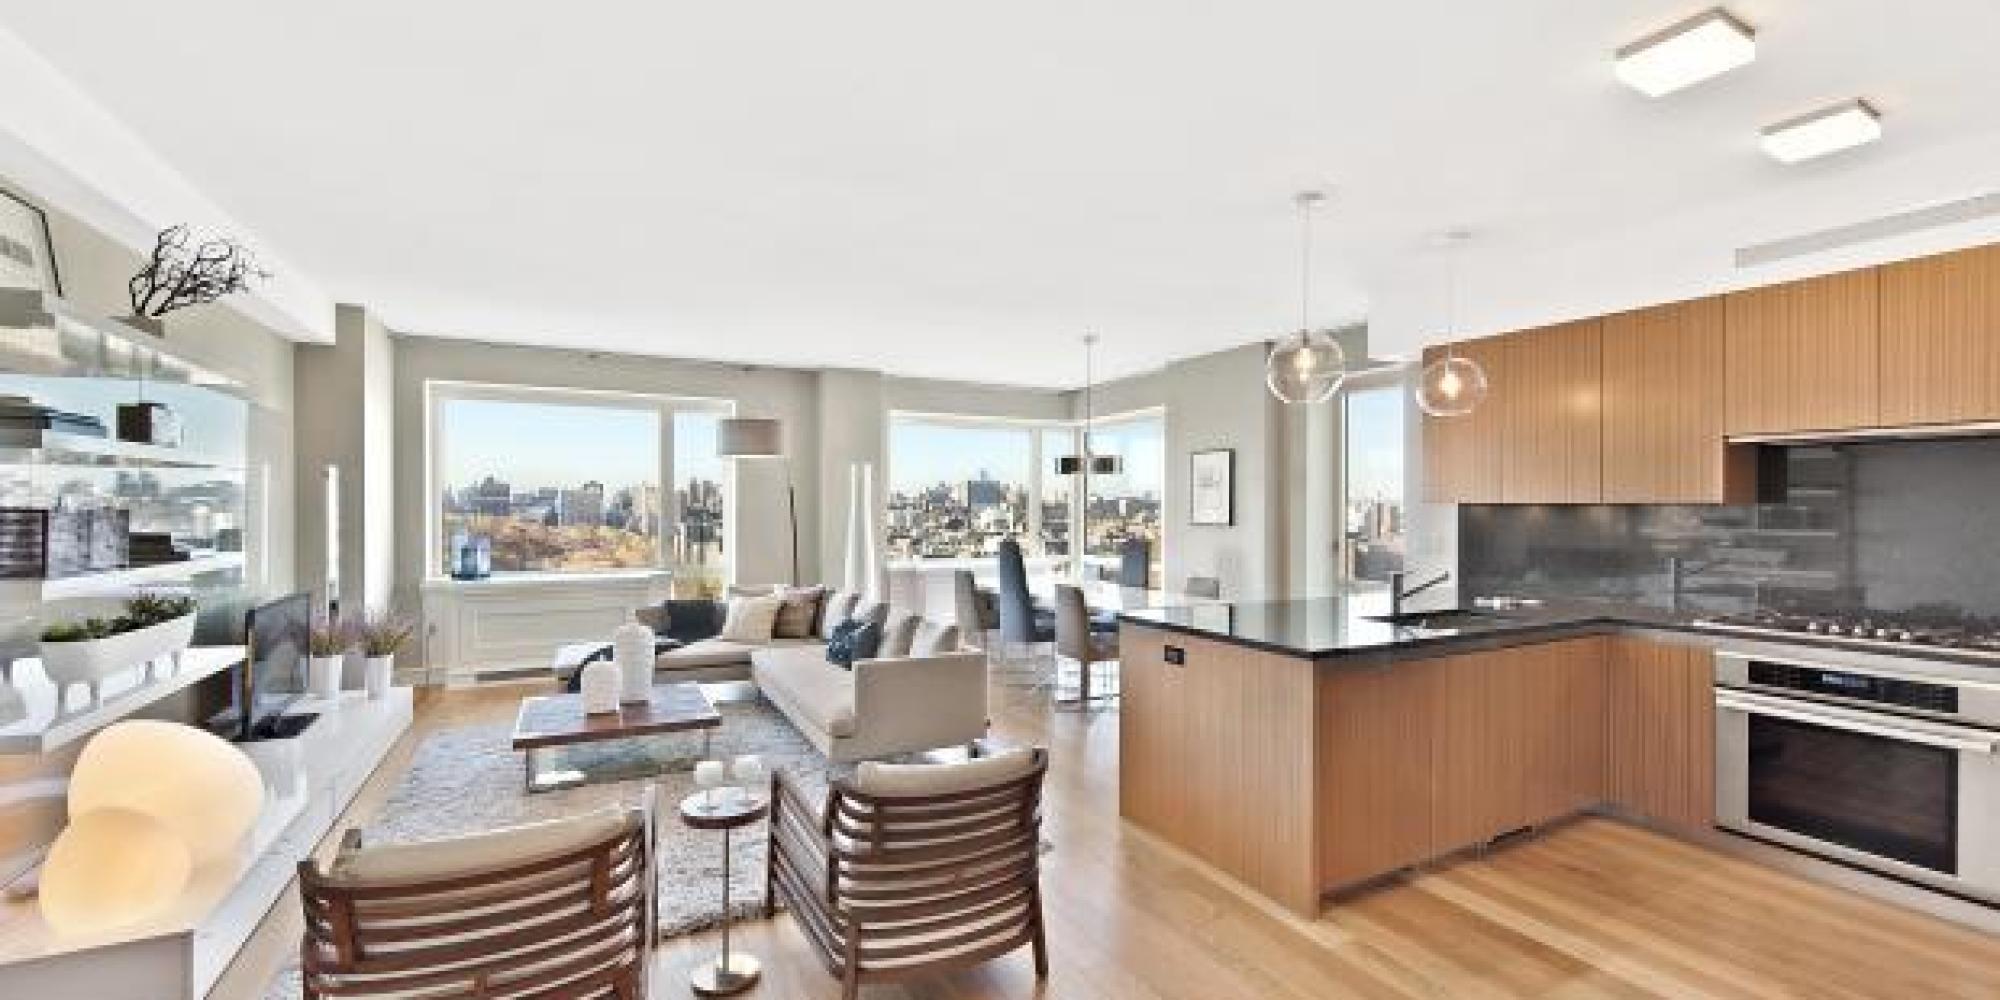 manhattan 39 s priciest condos average 5 487 per square foot huffpost. Black Bedroom Furniture Sets. Home Design Ideas